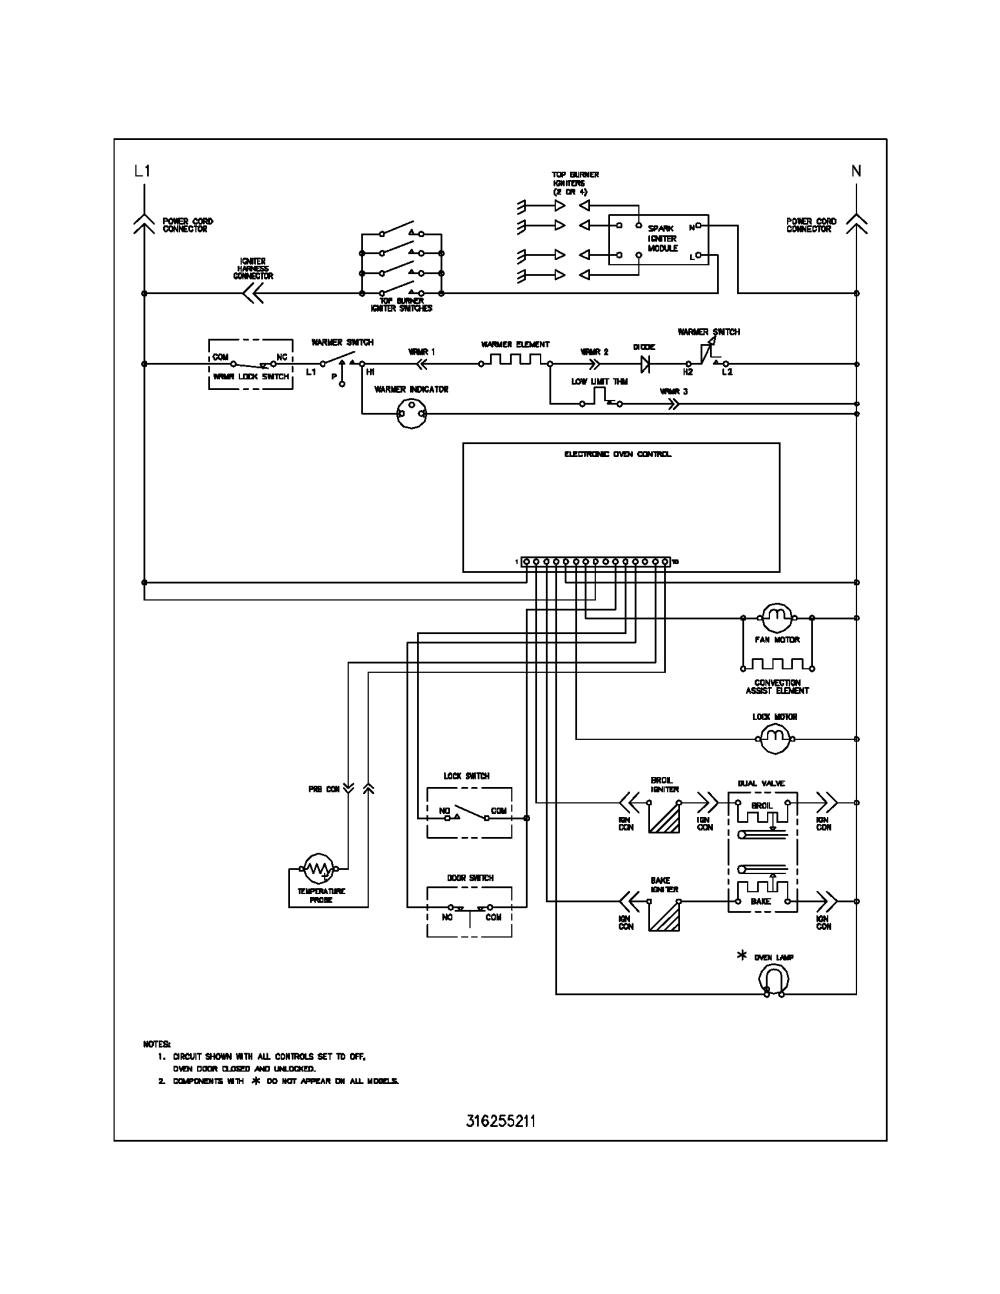 medium resolution of frigidaire plgf389ccc gas range timer stove clocks and applianceplgf389ccc gas range wiring schematic parts diagram